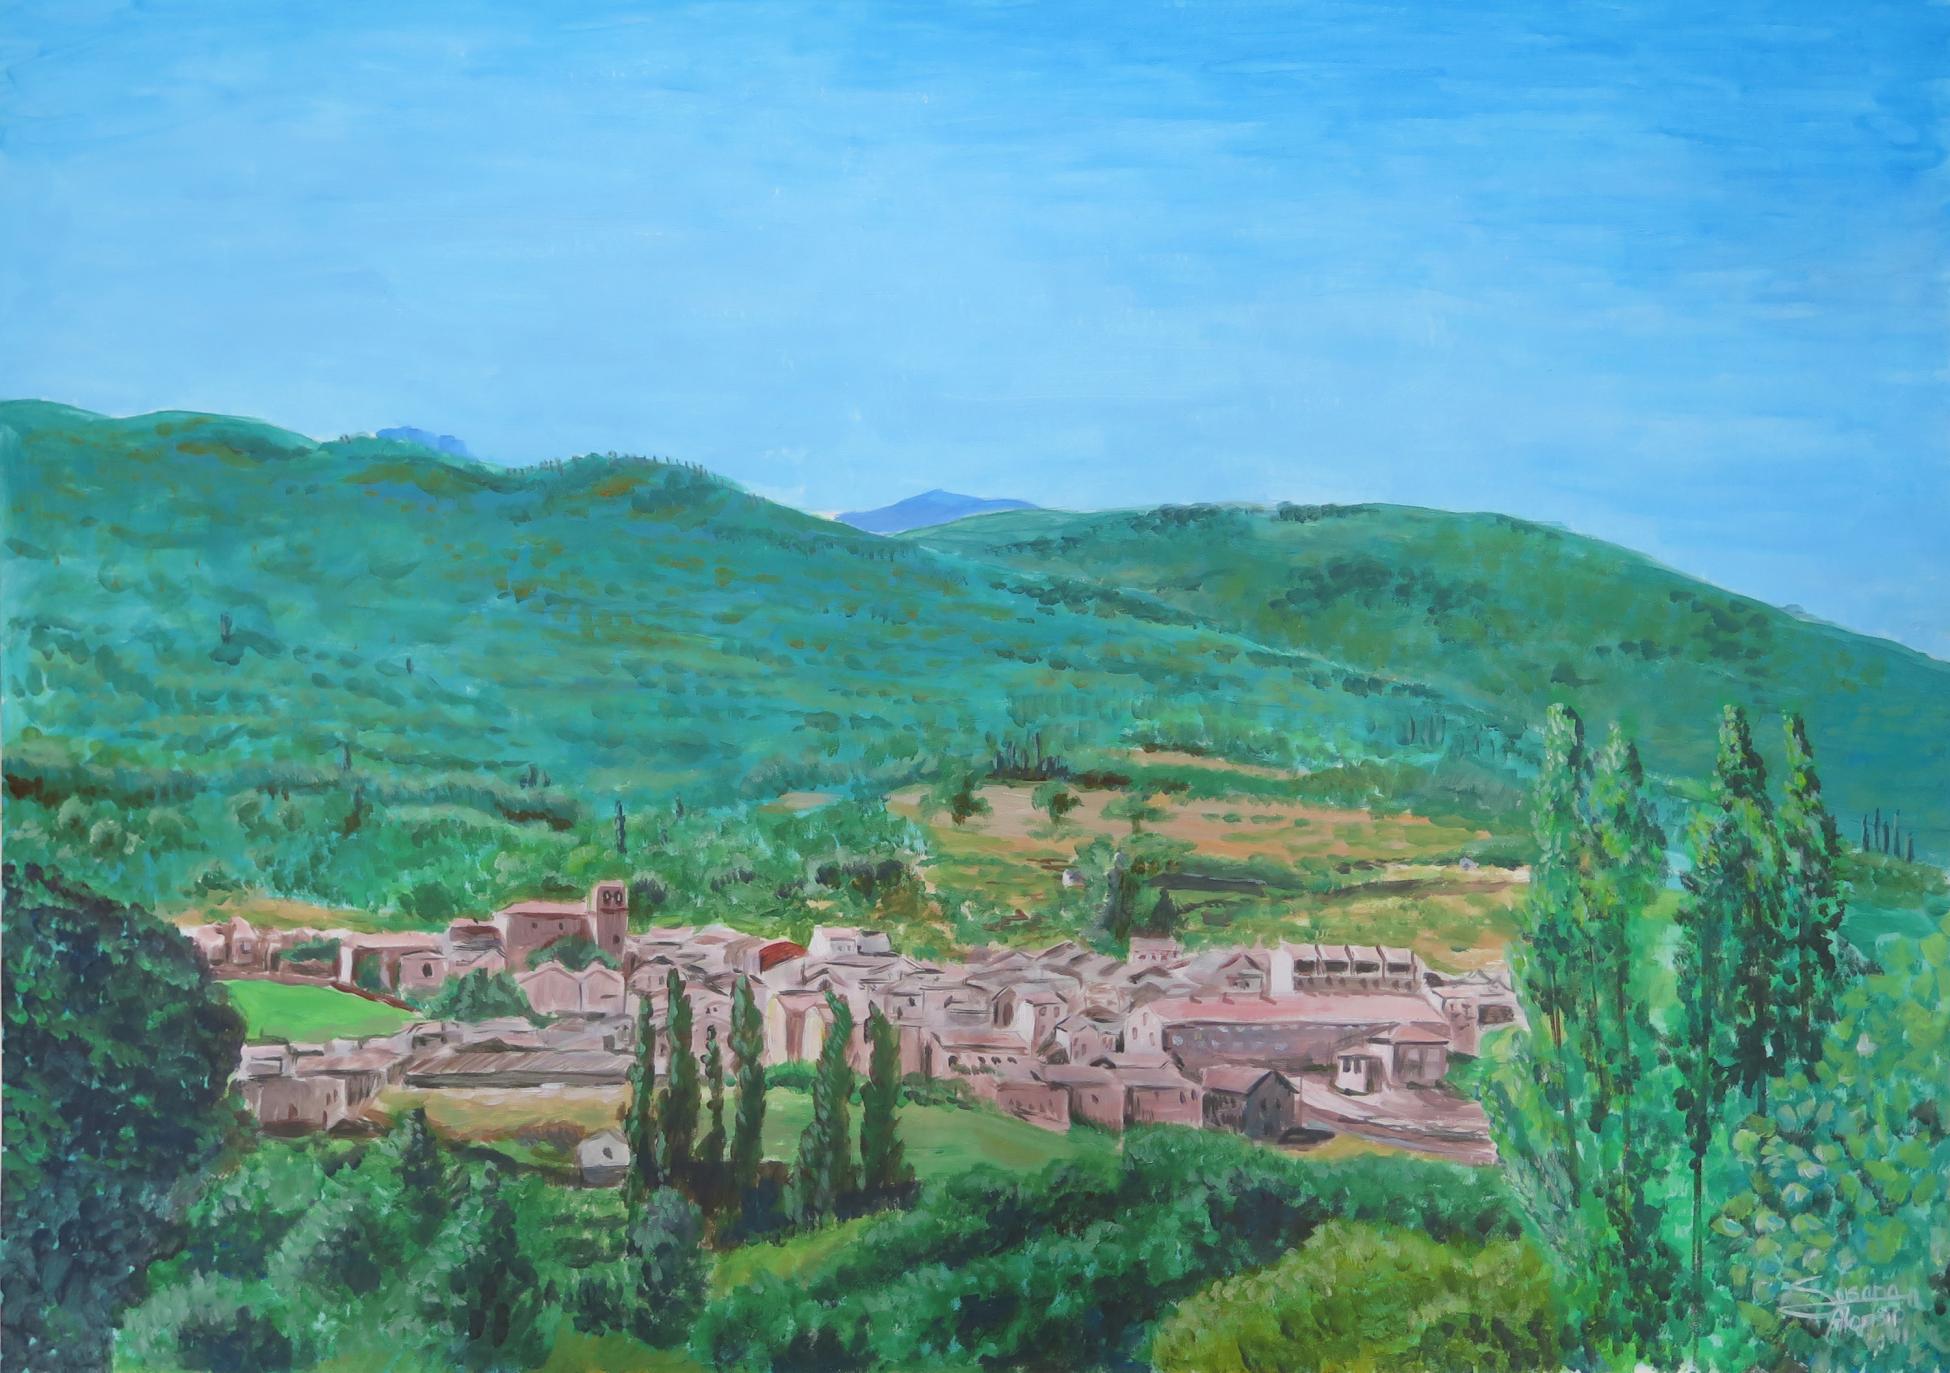 Villafranca de la sierra (2011) - Alonso de Sousa